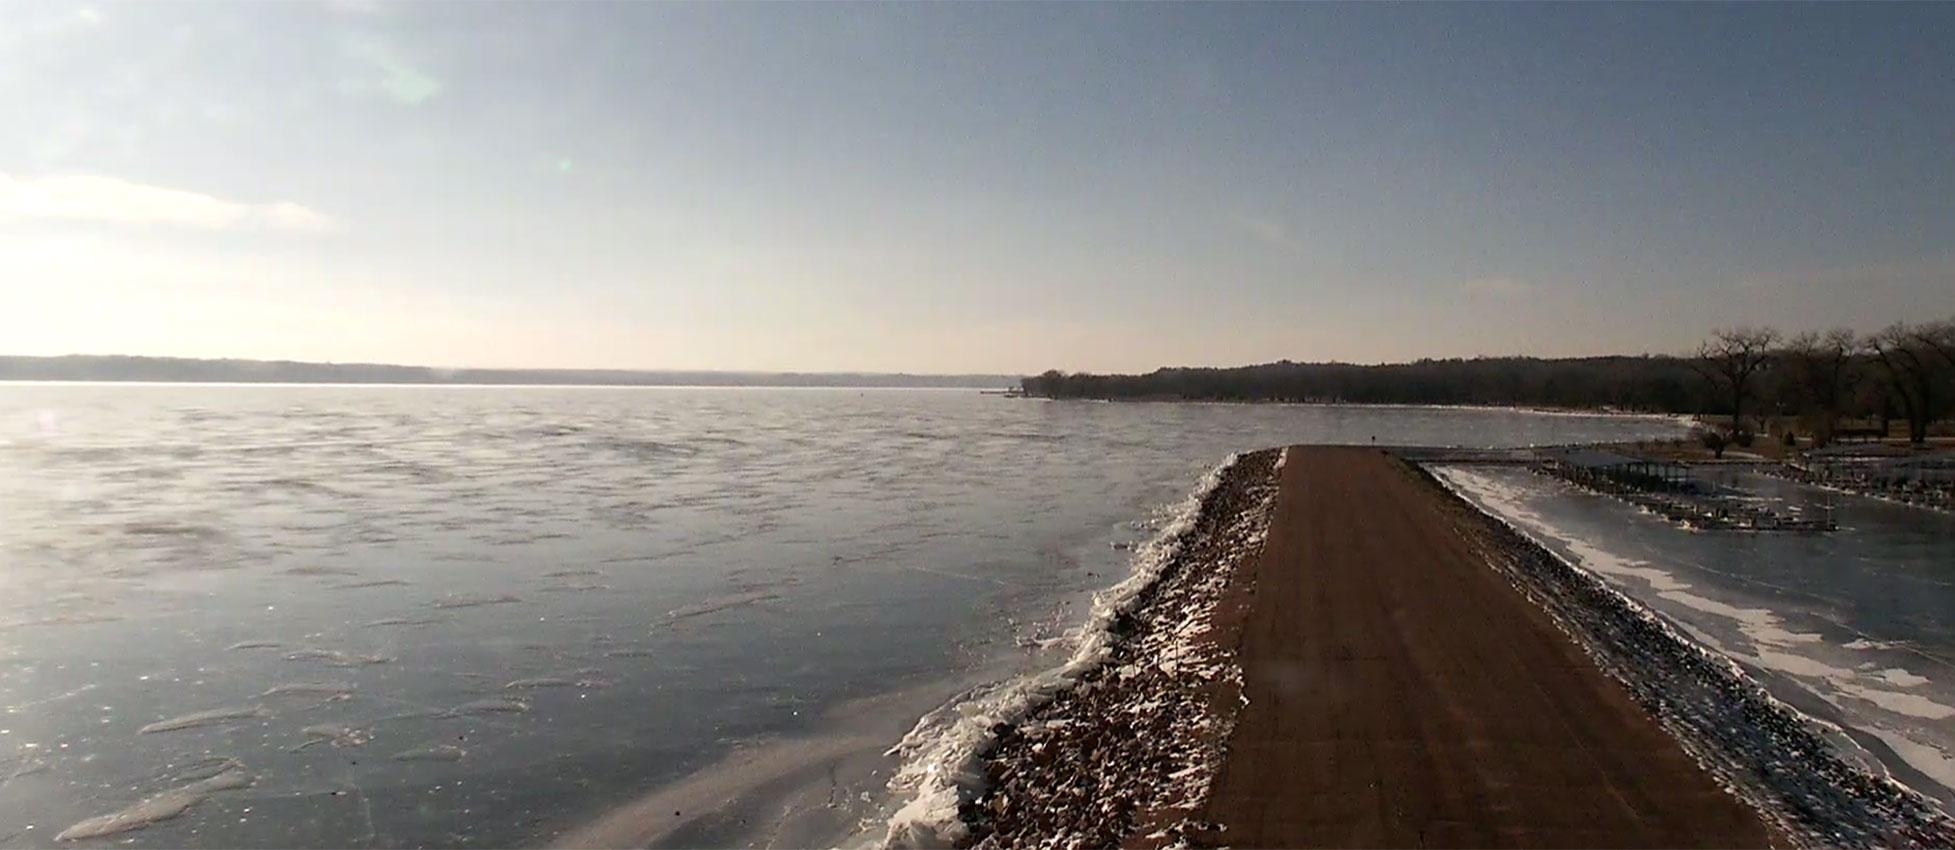 Yankton skycam winter weather South Dakota